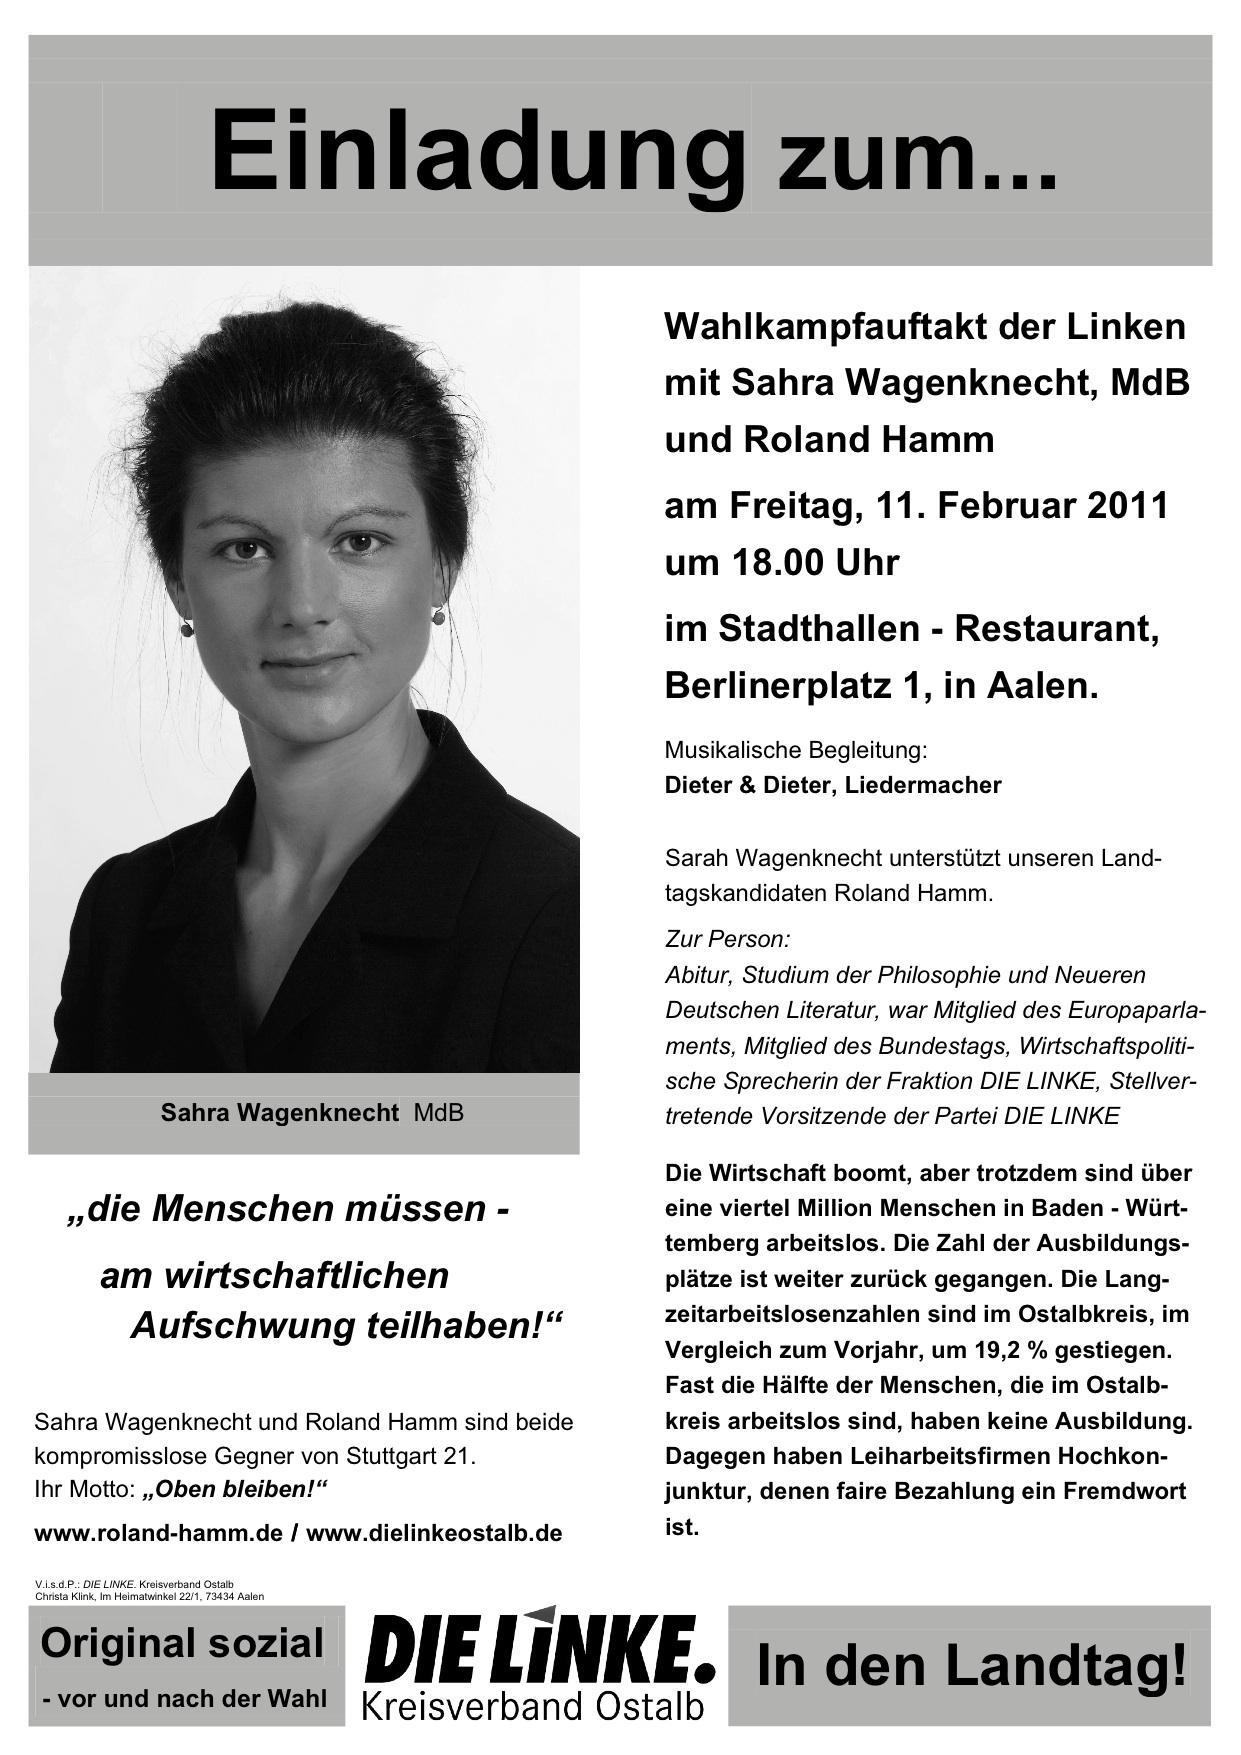 Wagenknecht Veranstaltung 11.02.11 in Aalen